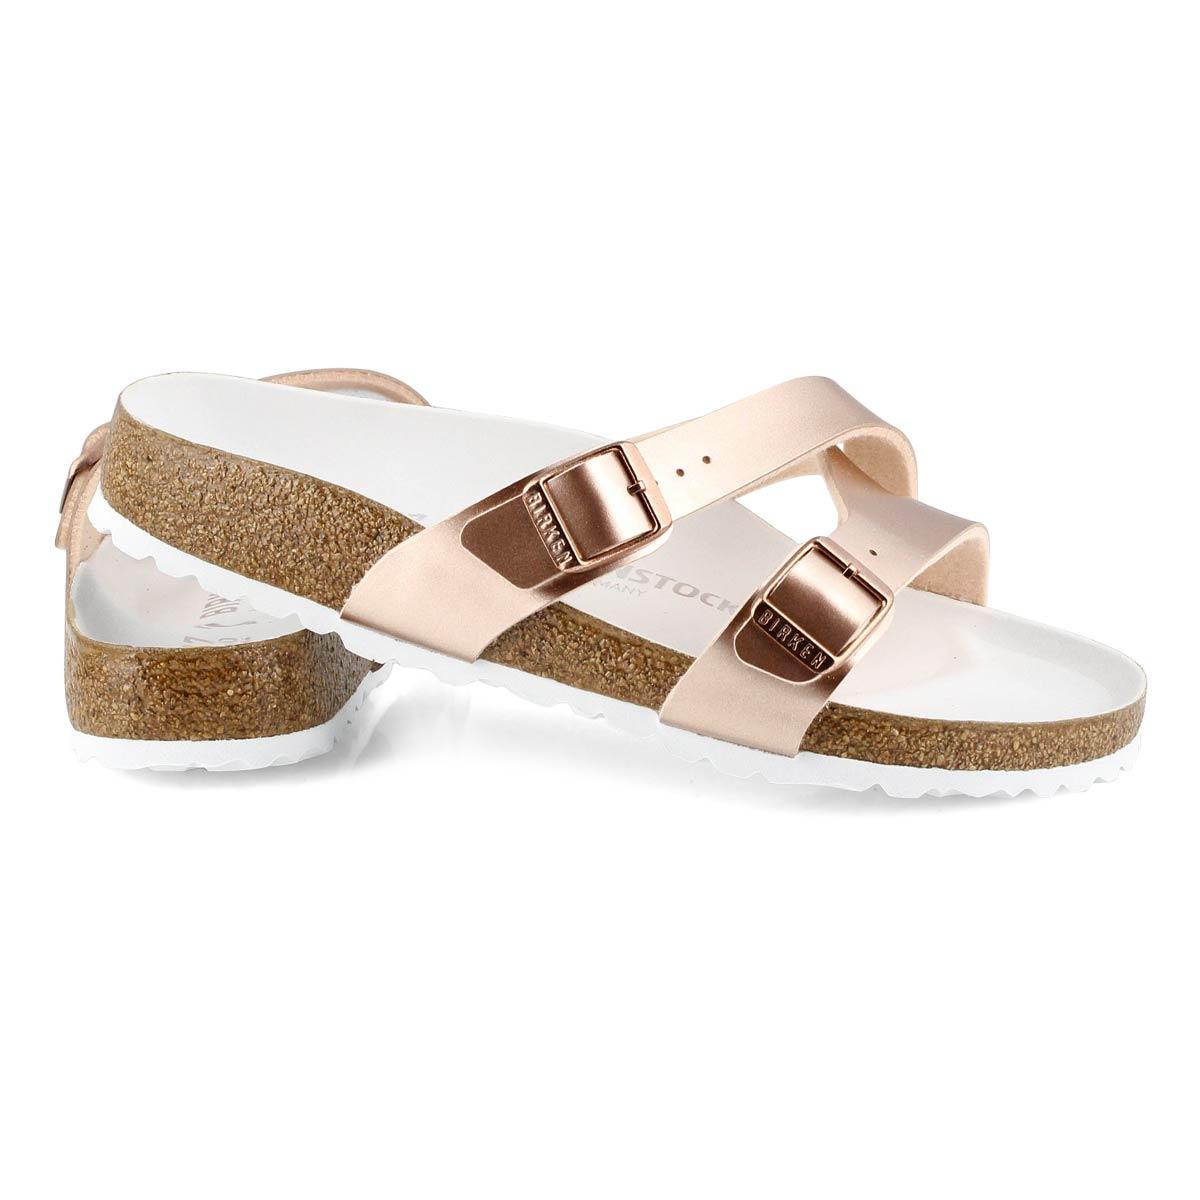 Women's Yao Narrow Sandal - Metallic Copper